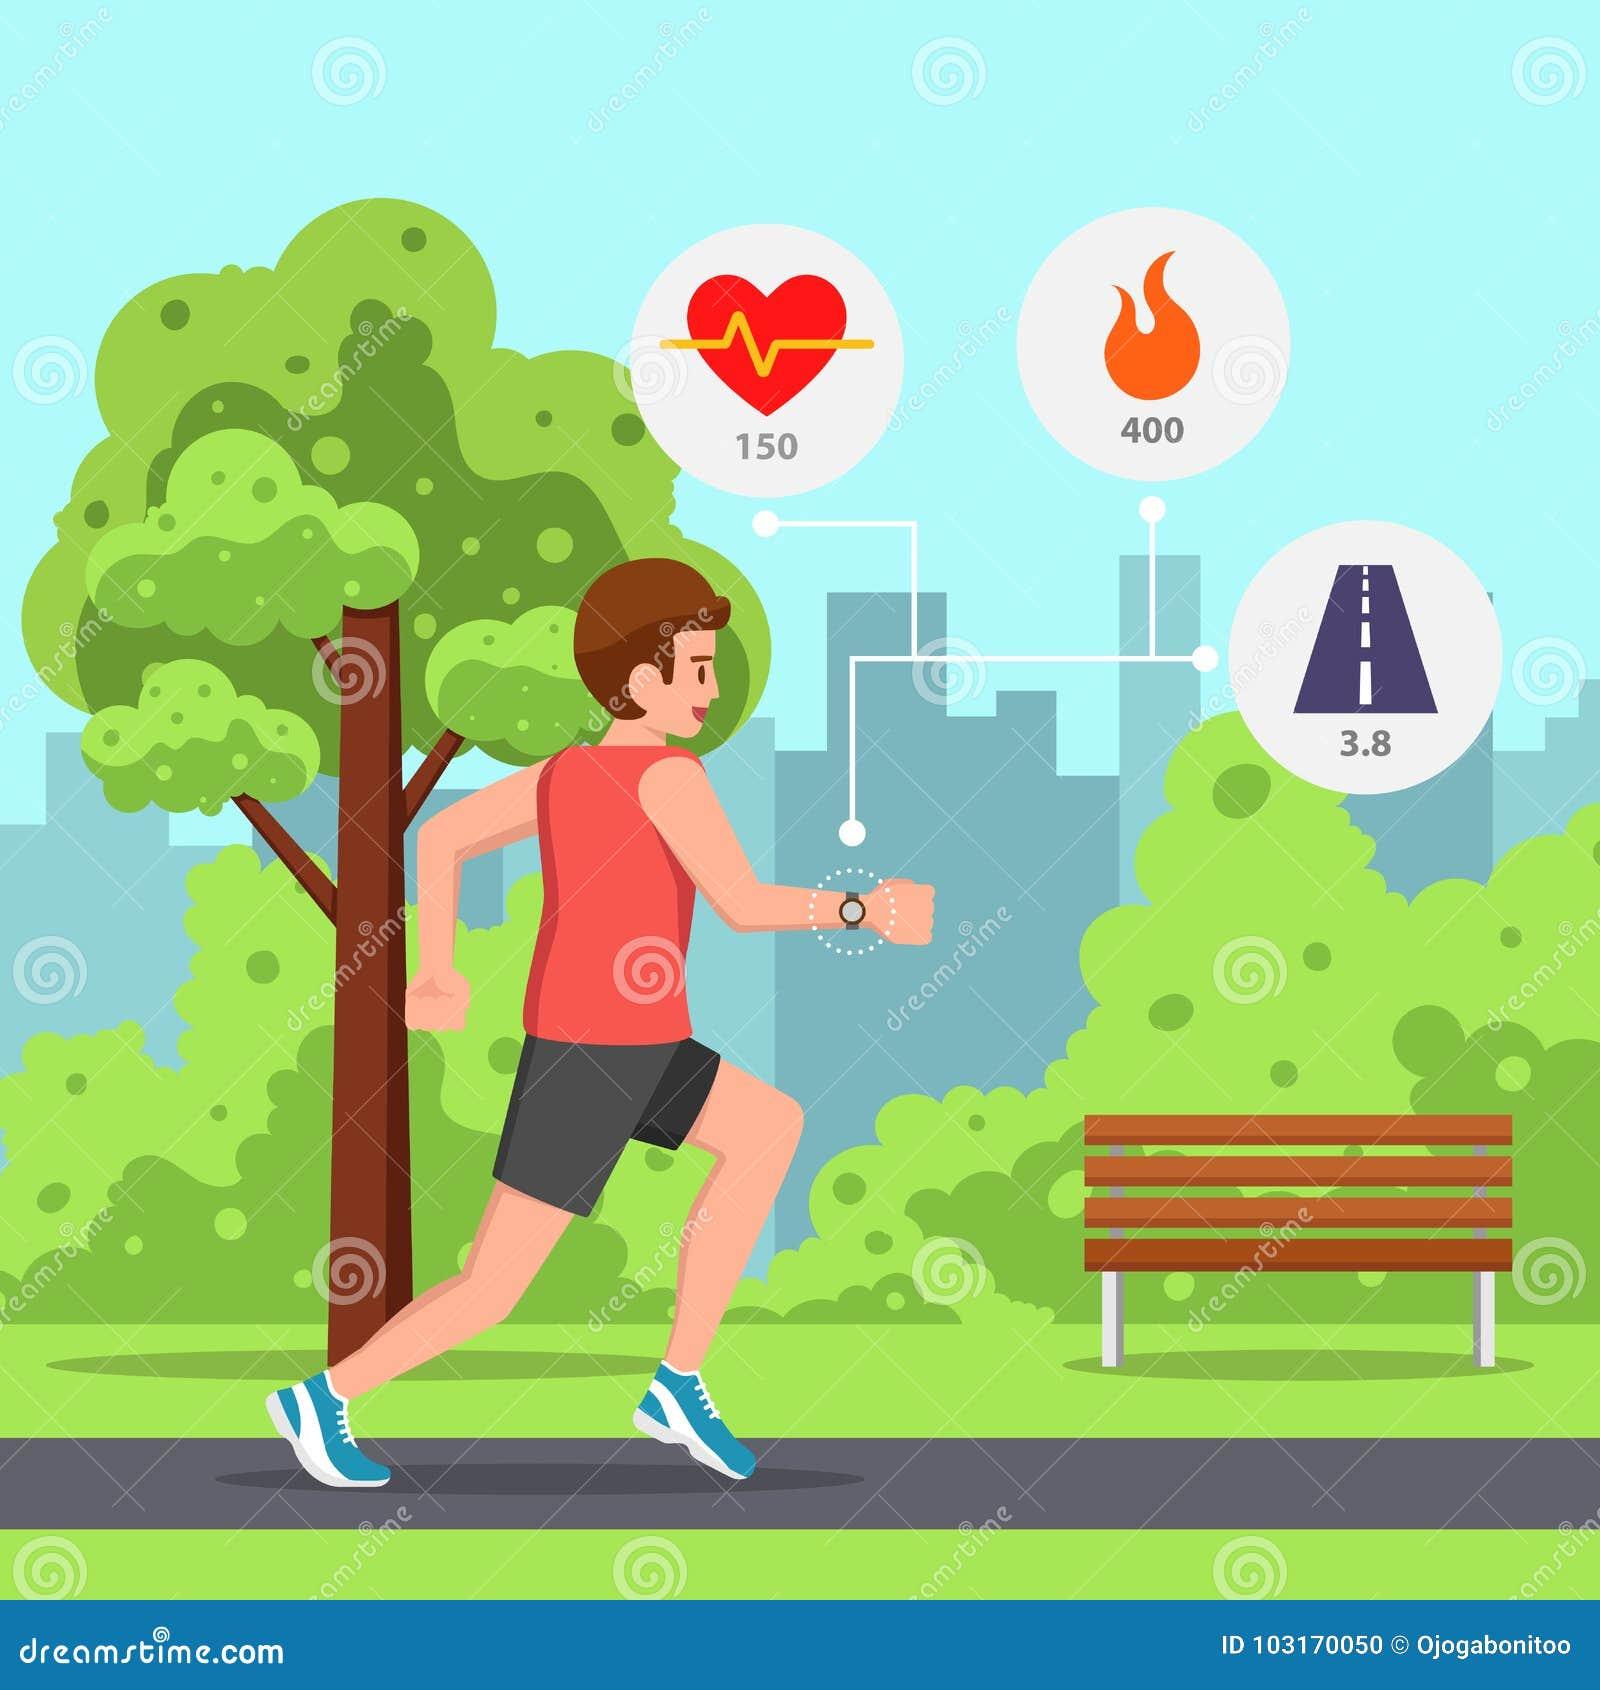 Runner Man Running Heart Rate Monitor Stock Illustrations 37